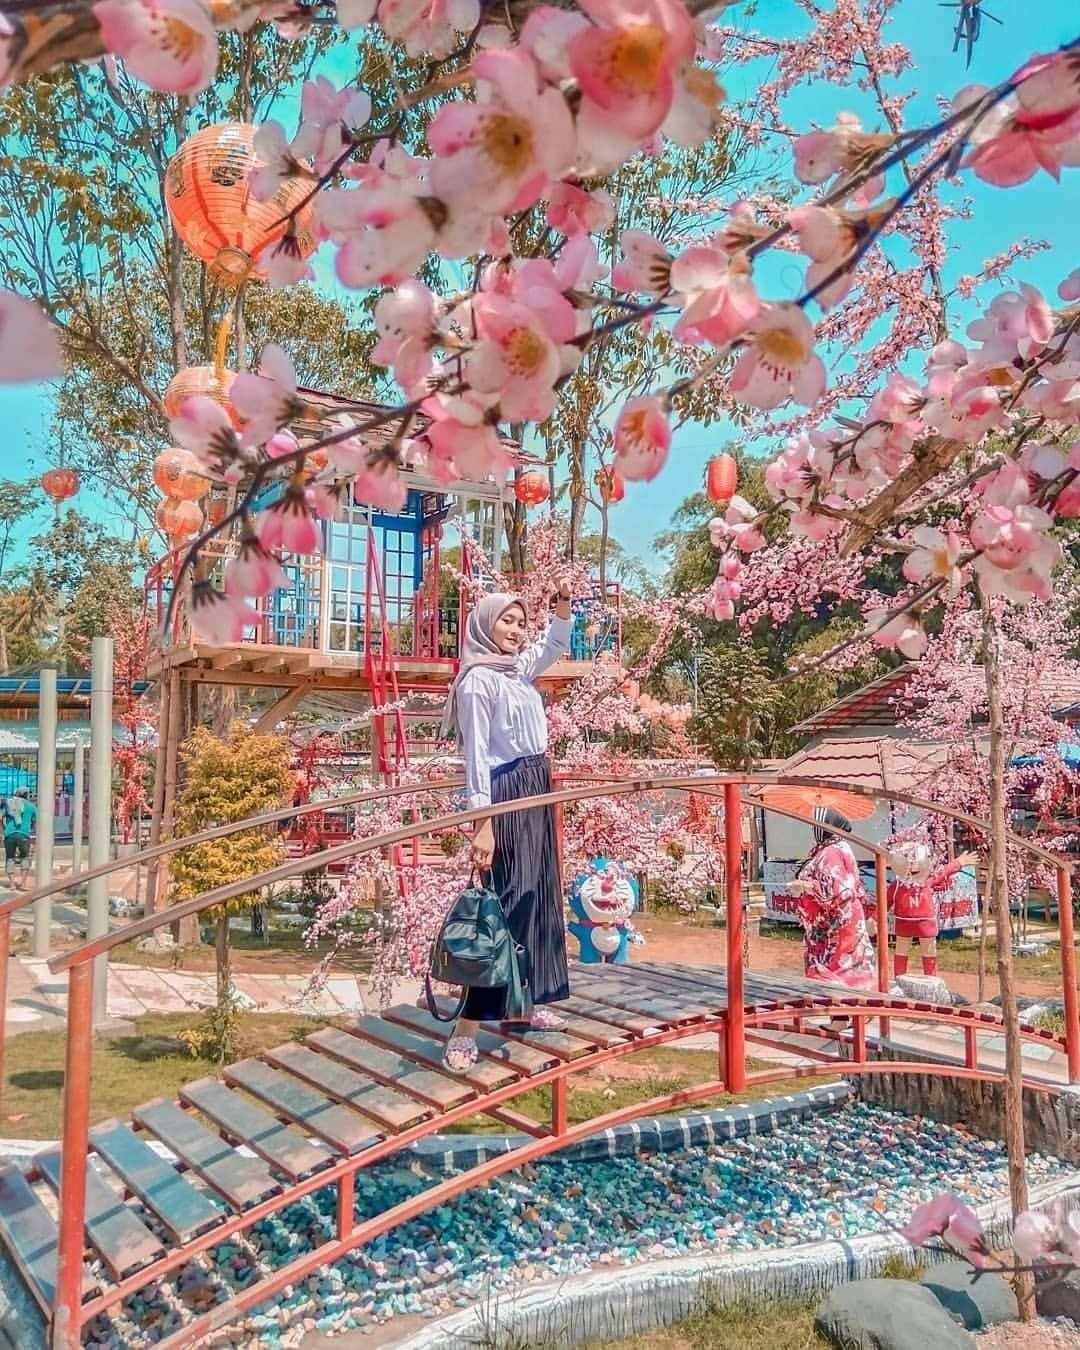 Berfoto Dengan Banyaknya Bunga di Istana Sakura Image From @_miraridyaseptya